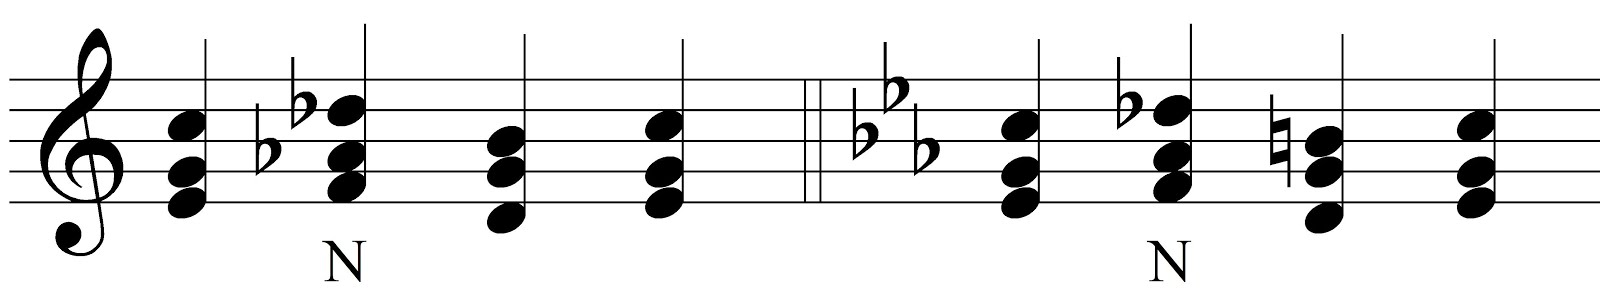 Music Theory Neapolitan Chords